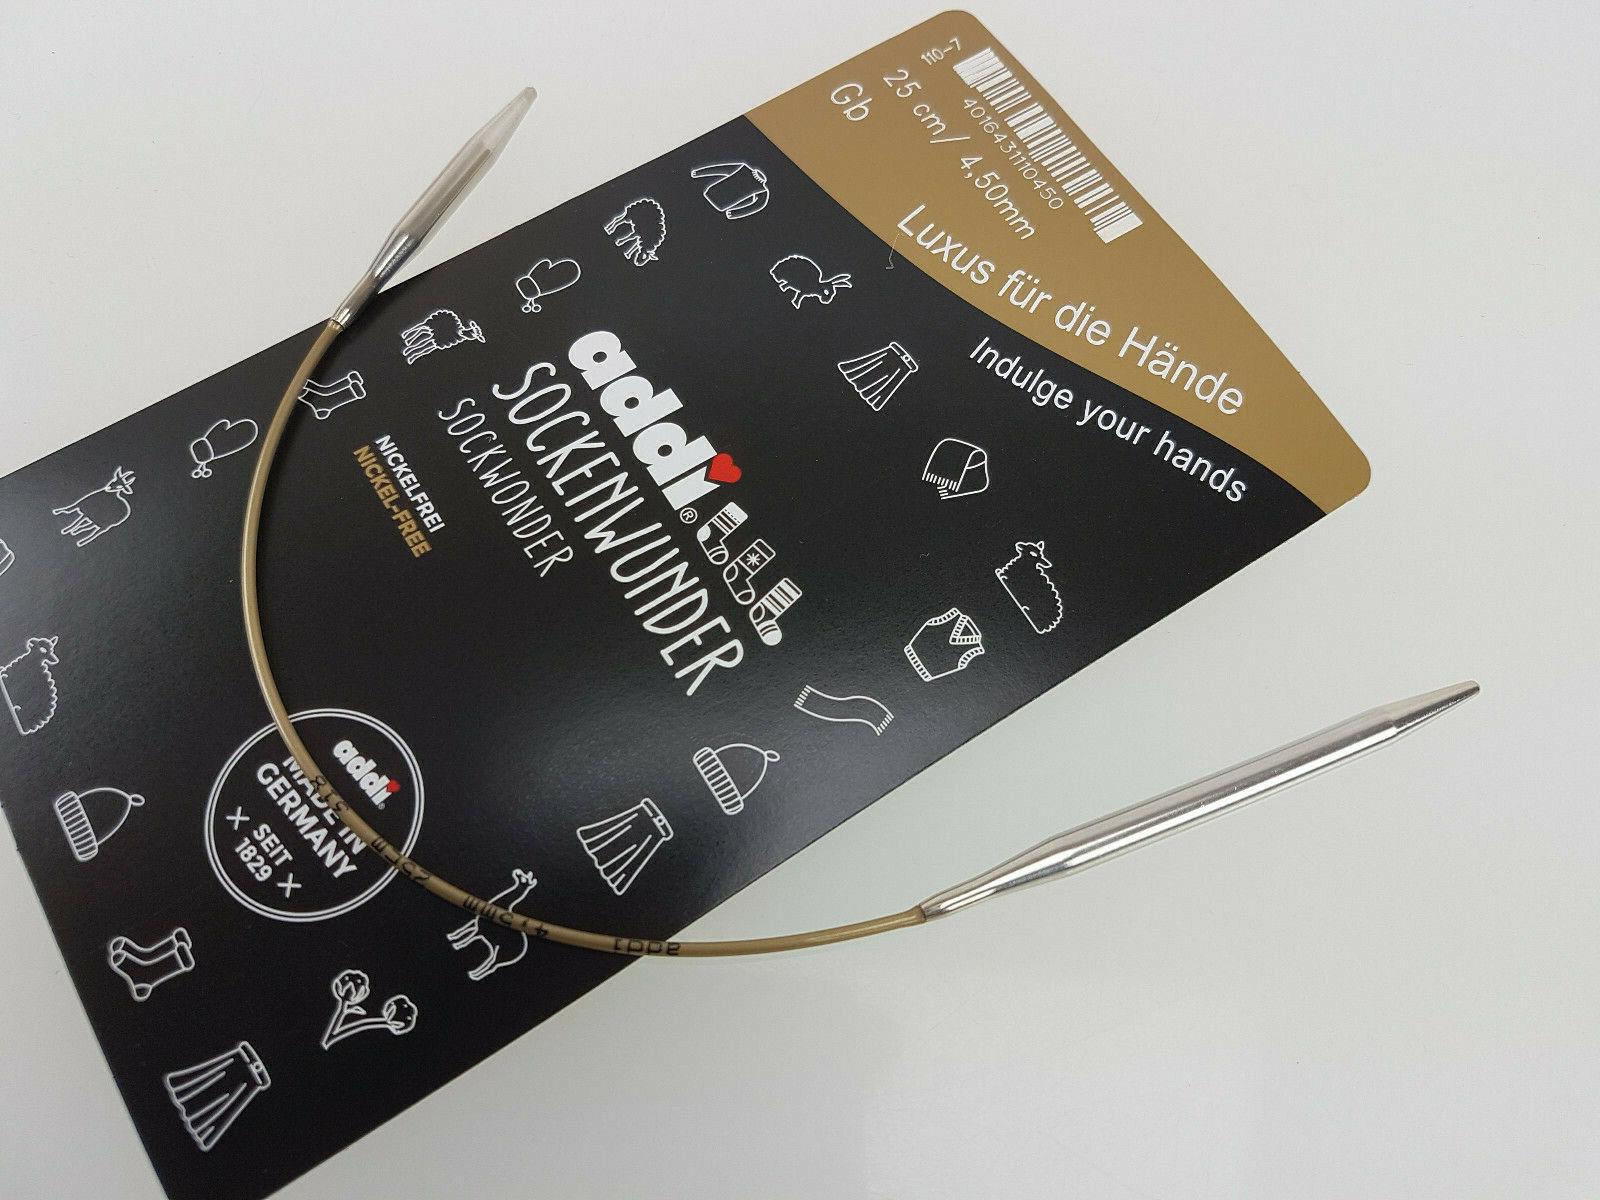 addi 110-7 1 Basic-Rundstricknadel Sockenwunder 25 cm 2.0 - 5.0 mm